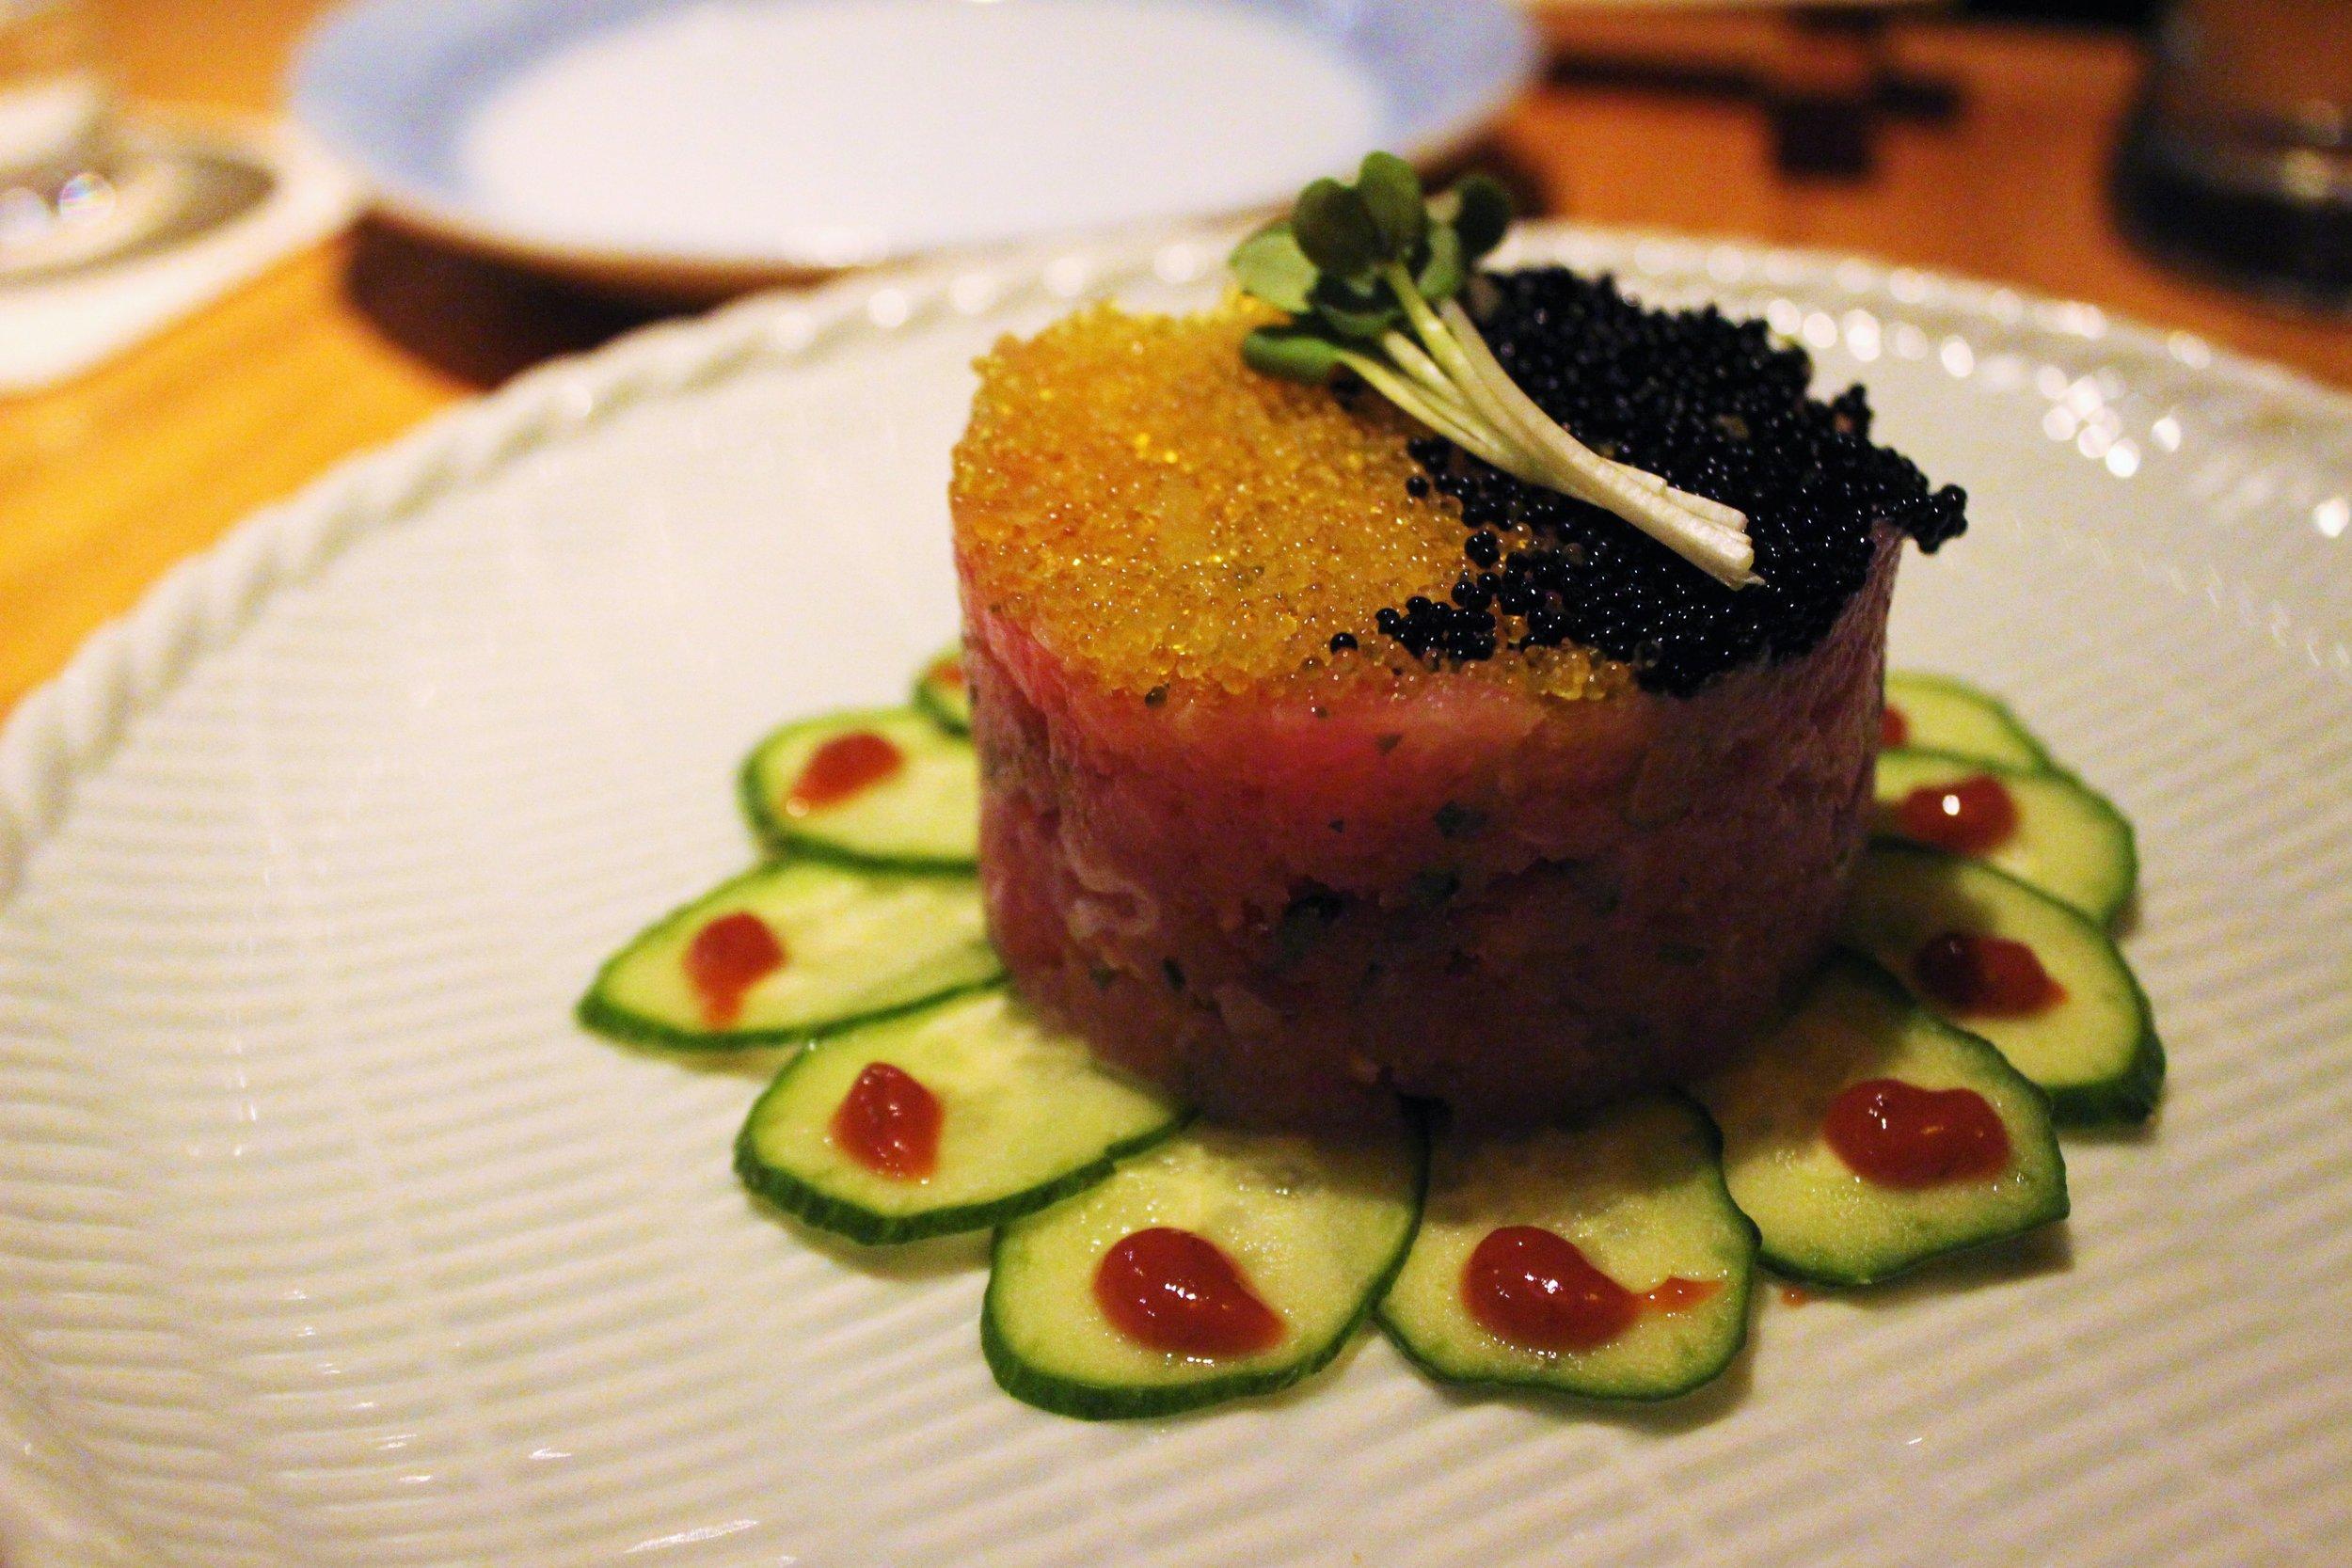 Maguro Tartar: Chopped Tuna with Flying Fish Roe and Steeped in Yuzu and Caviar at Sakagura